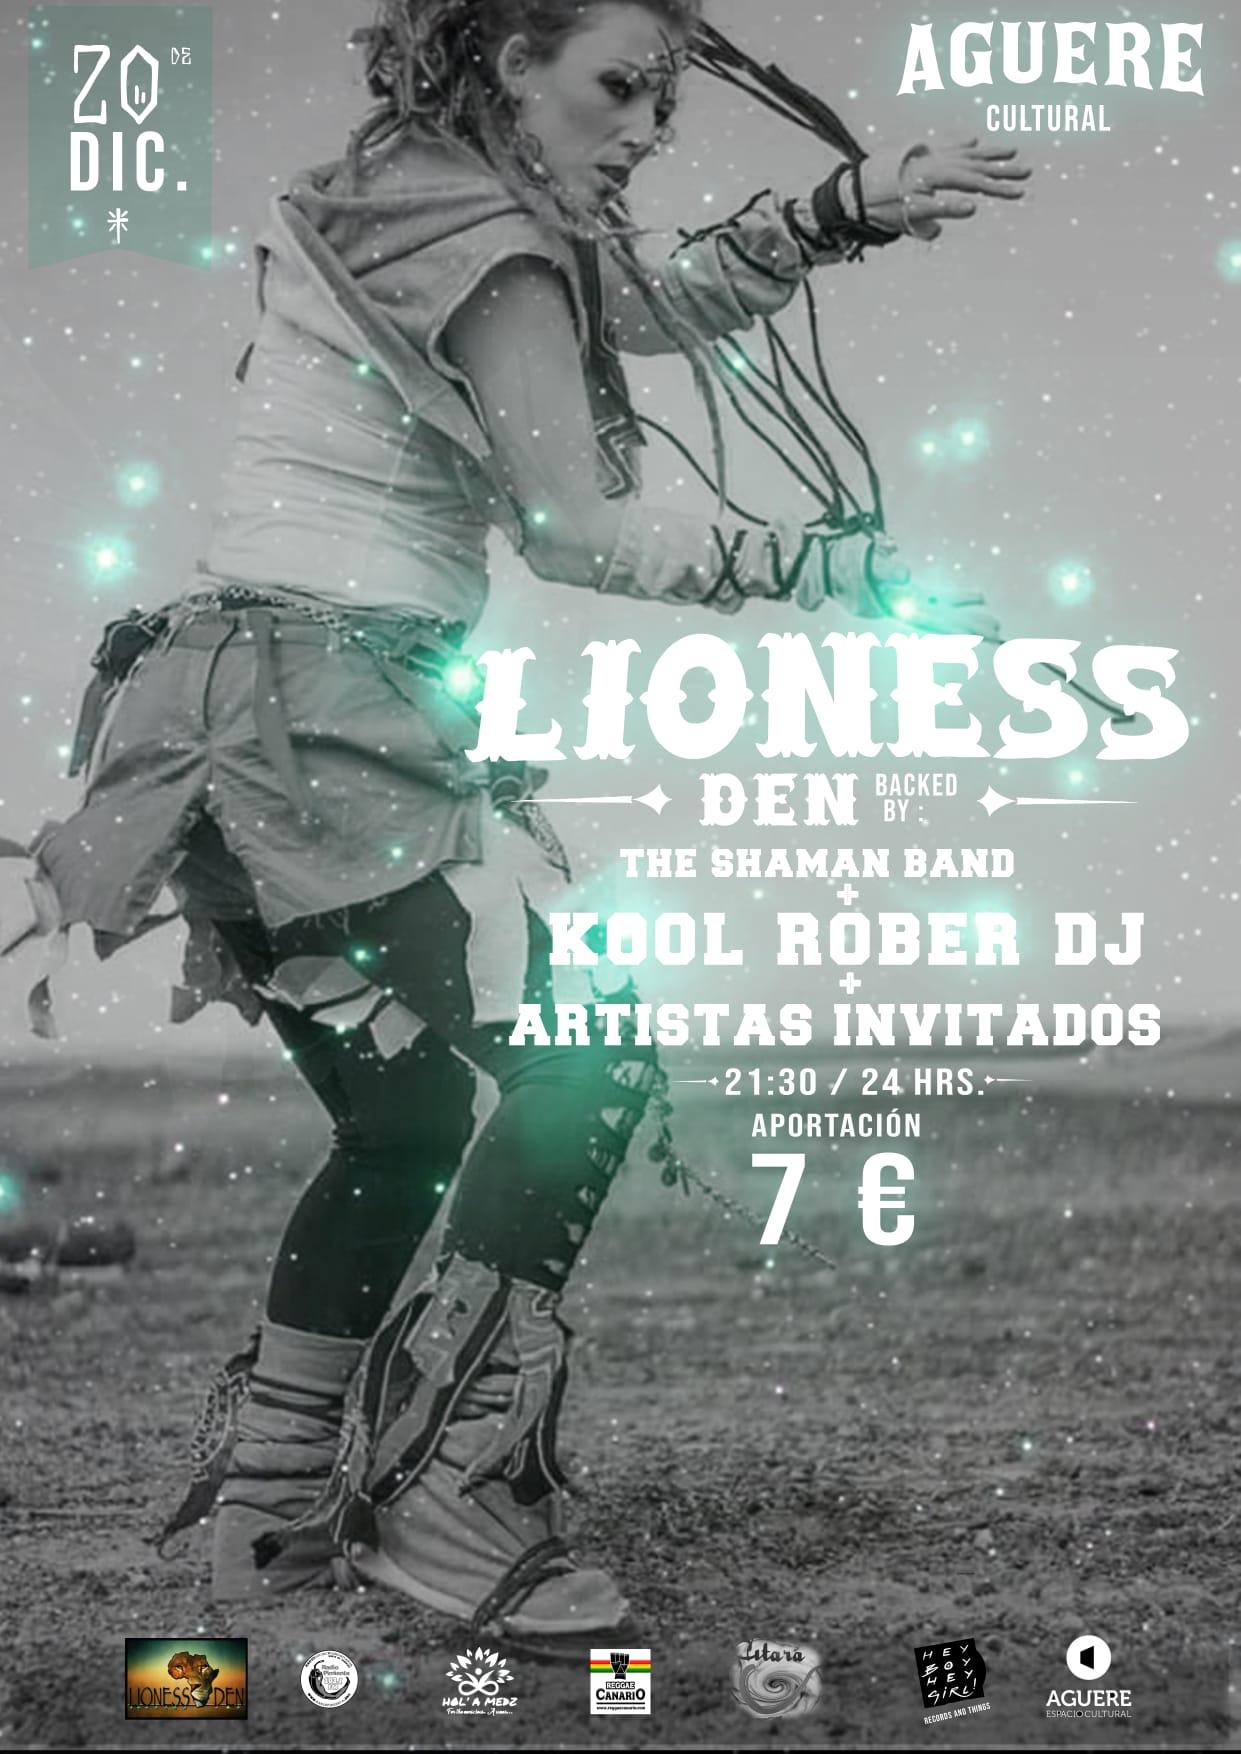 Lioness Den Shaman Band aguere cultural laguna diciembre 2019